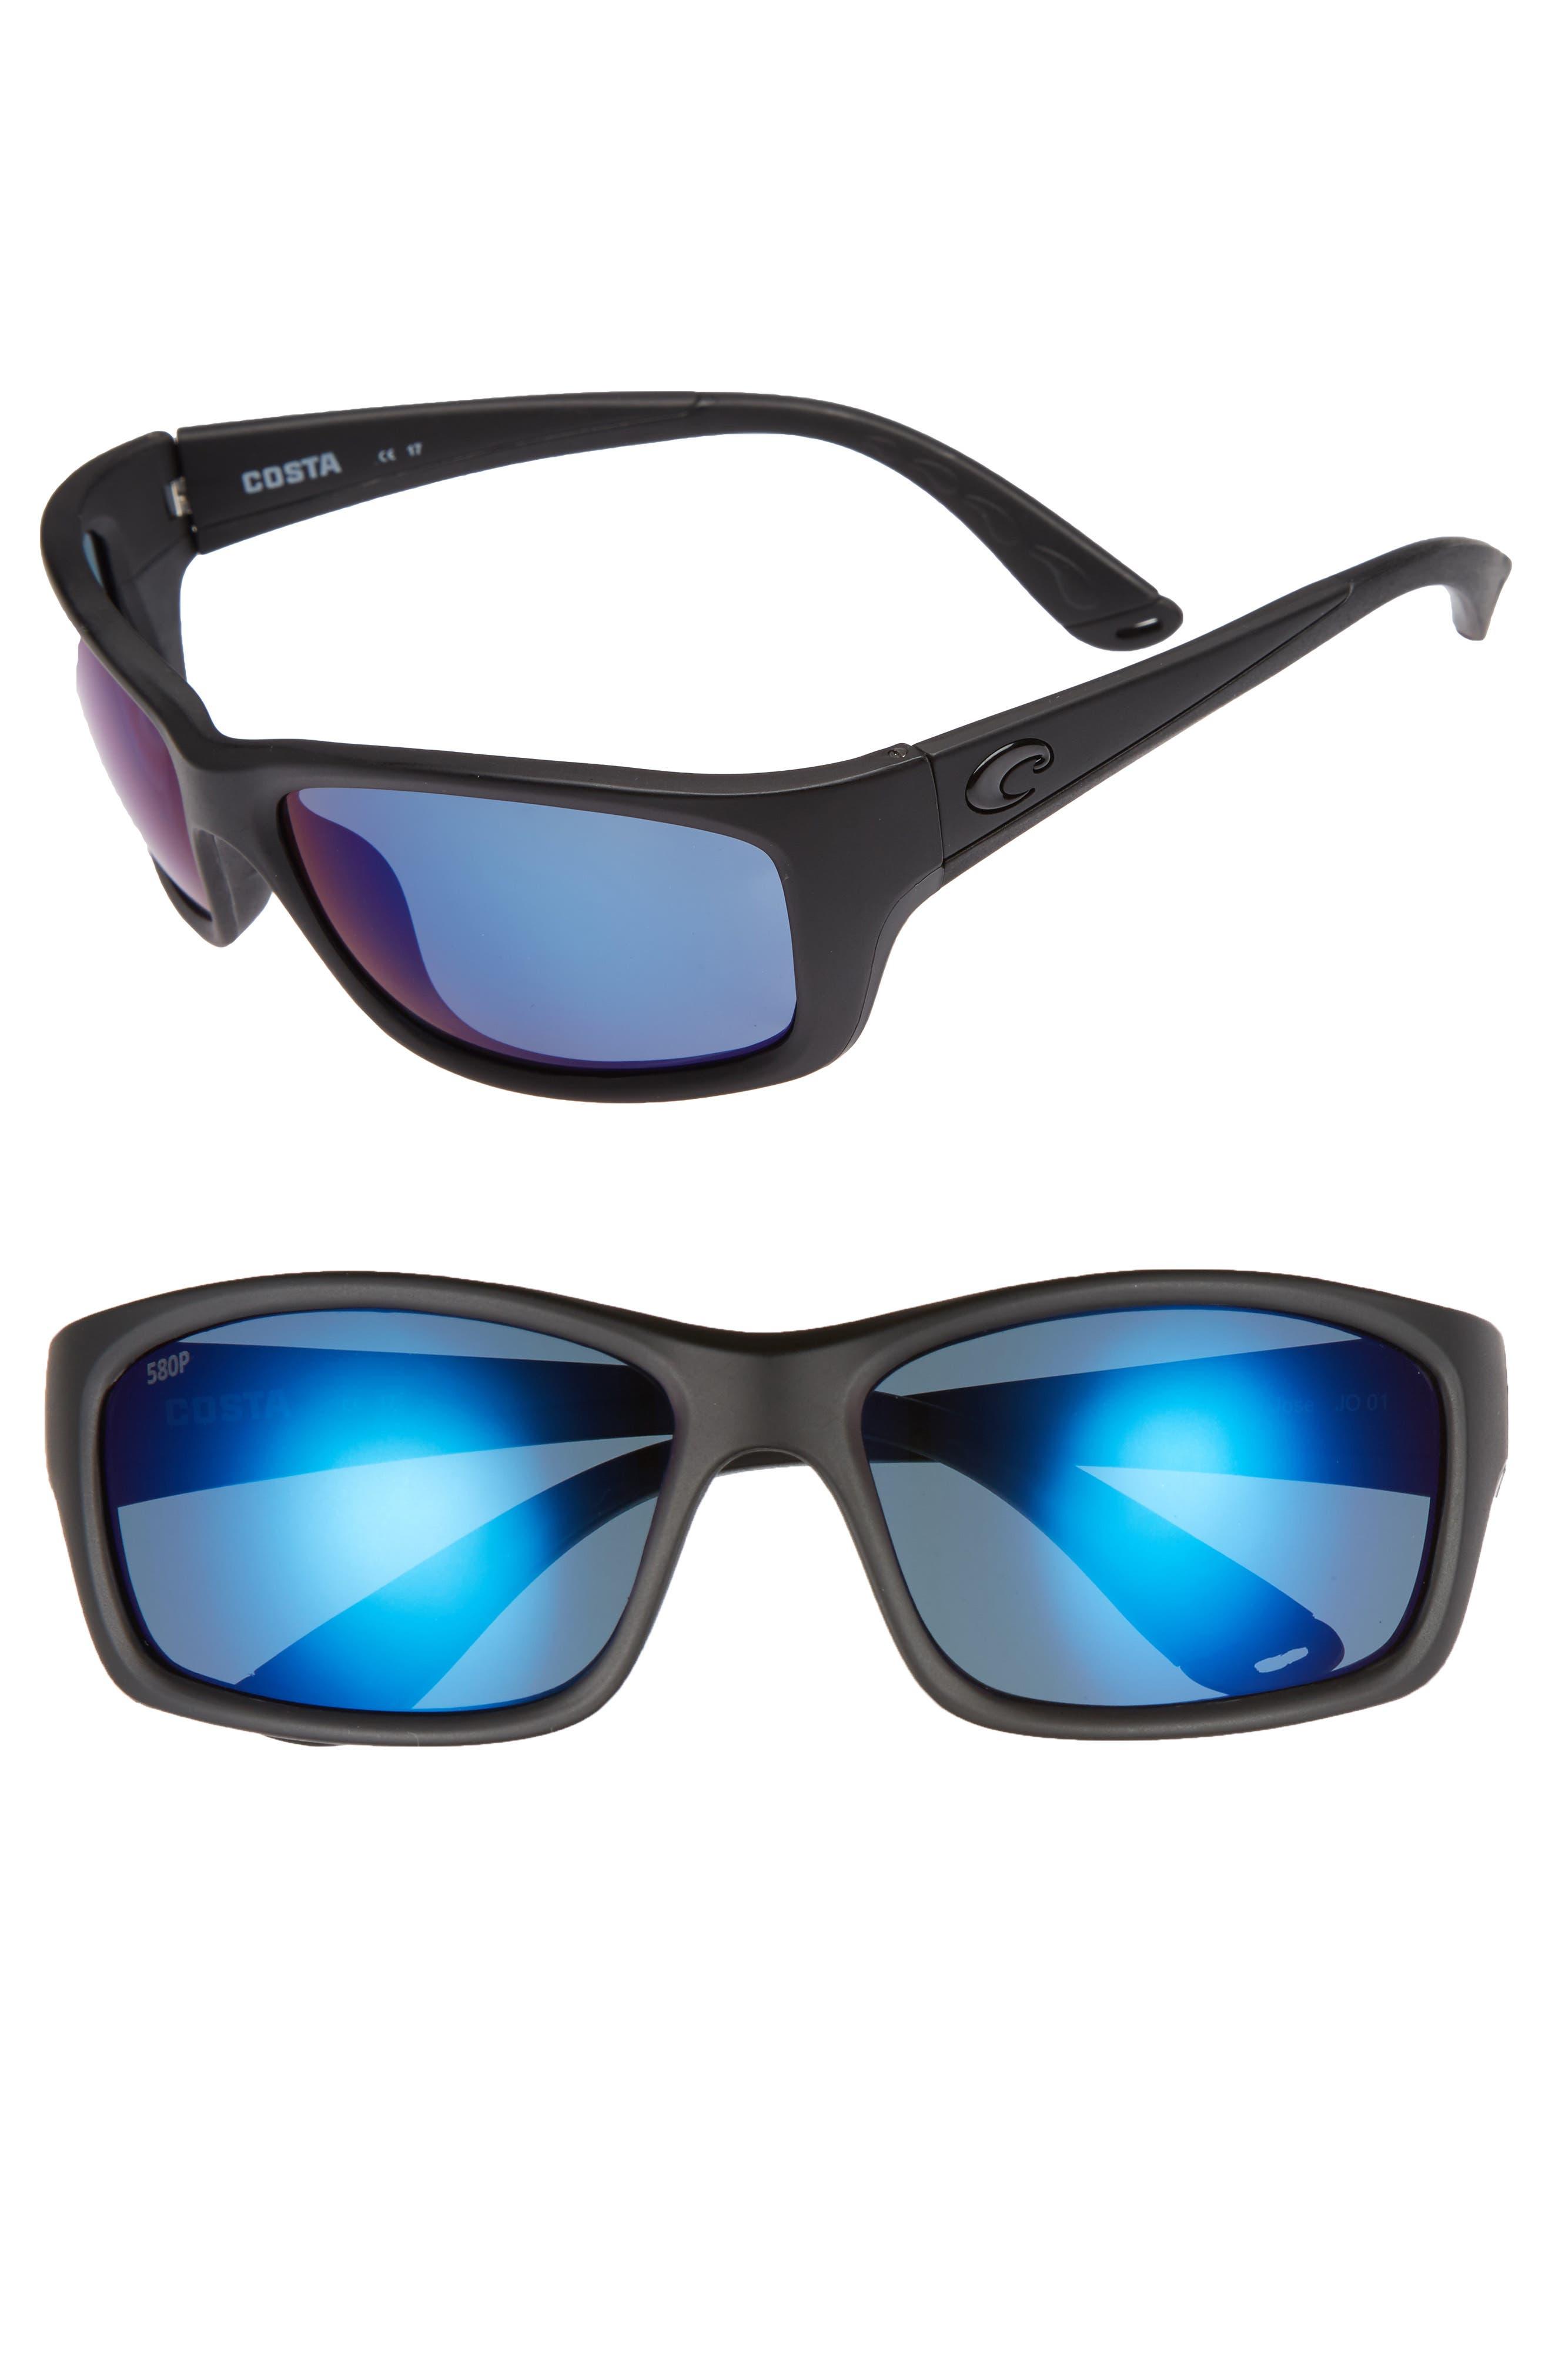 Jose 60mm Polarized Sunglasses,                         Main,                         color, Blackout/ Blue Mirror